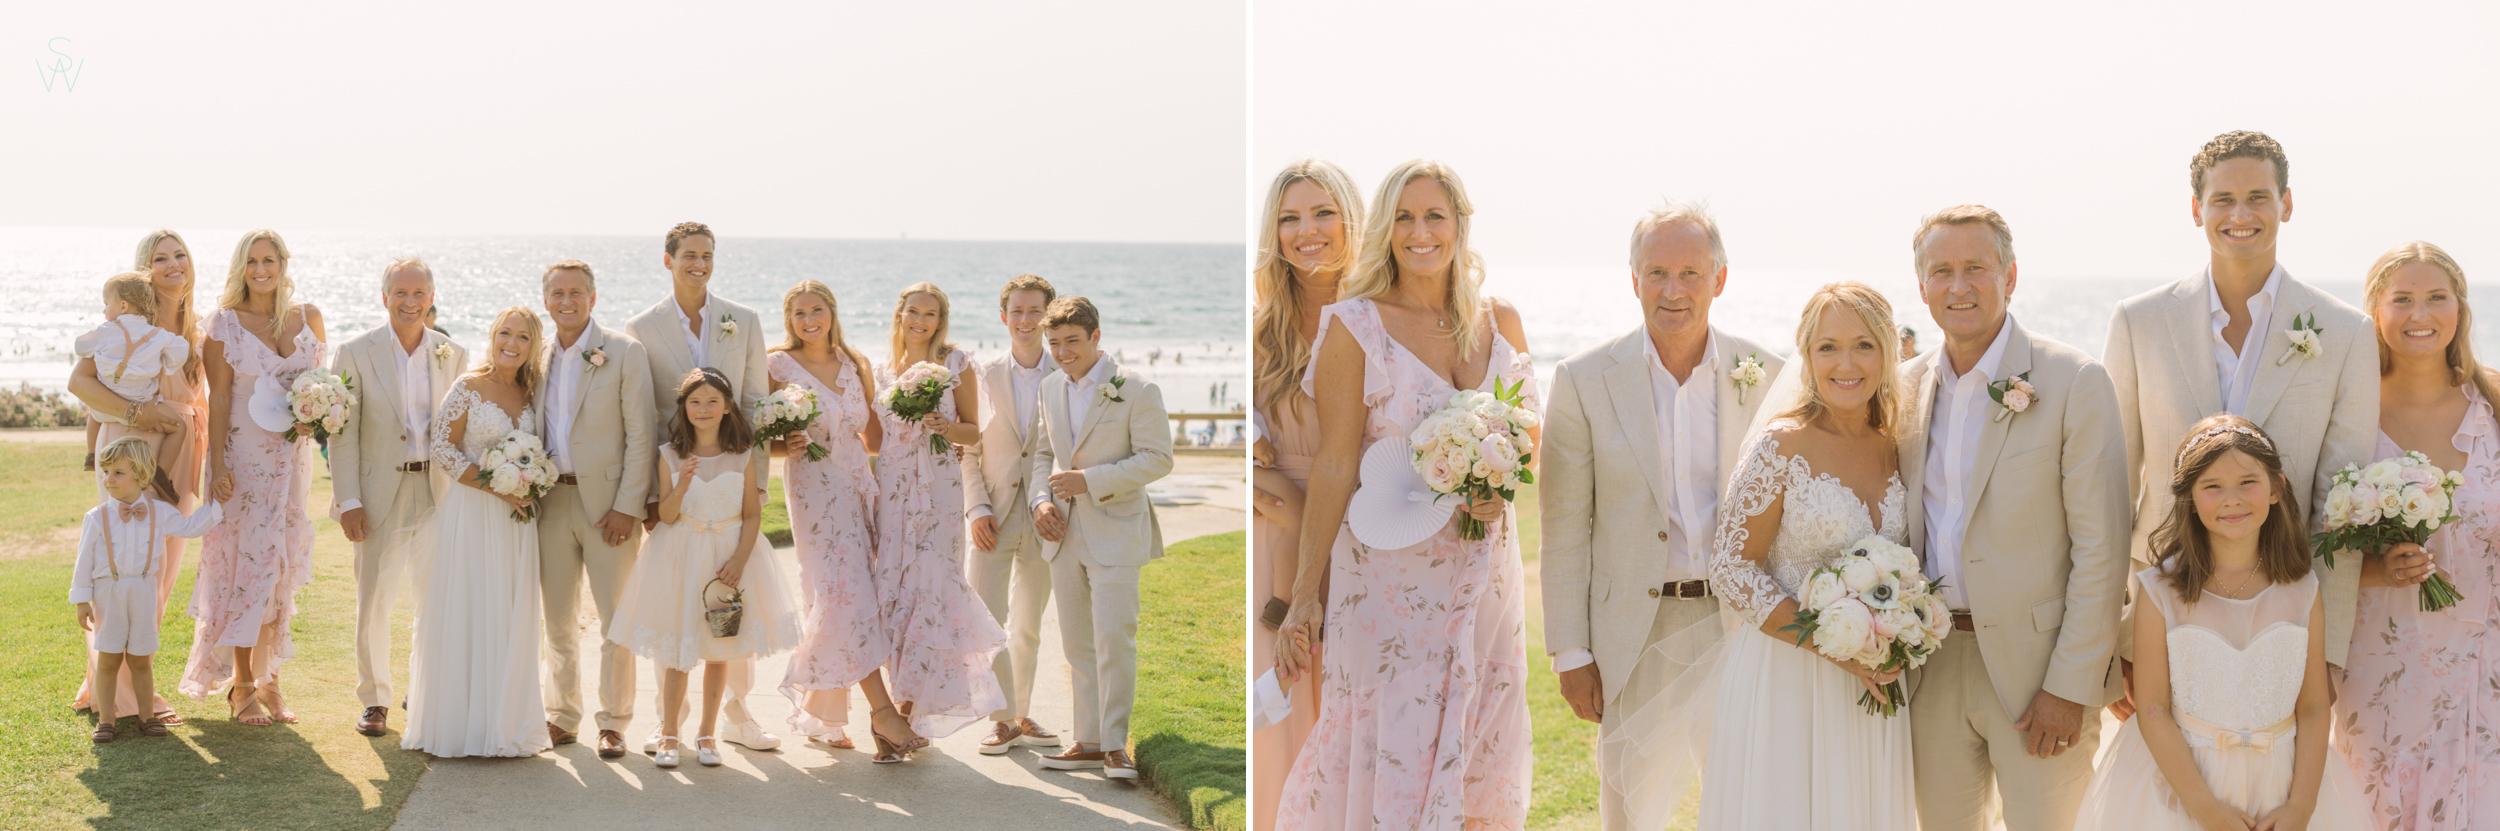 127DEL.MAR.WEDDINGS.photography.shewanders.JPG